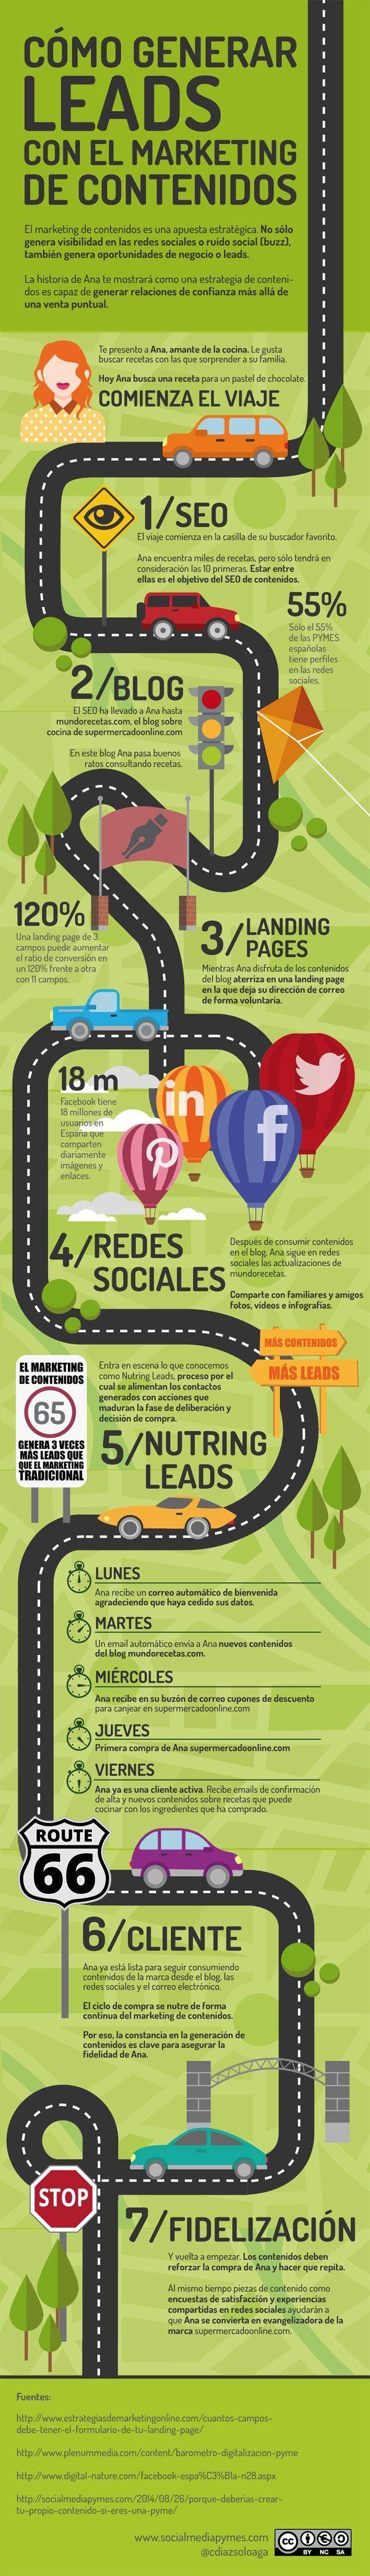 content-marketing,contenidos, ventas, leads